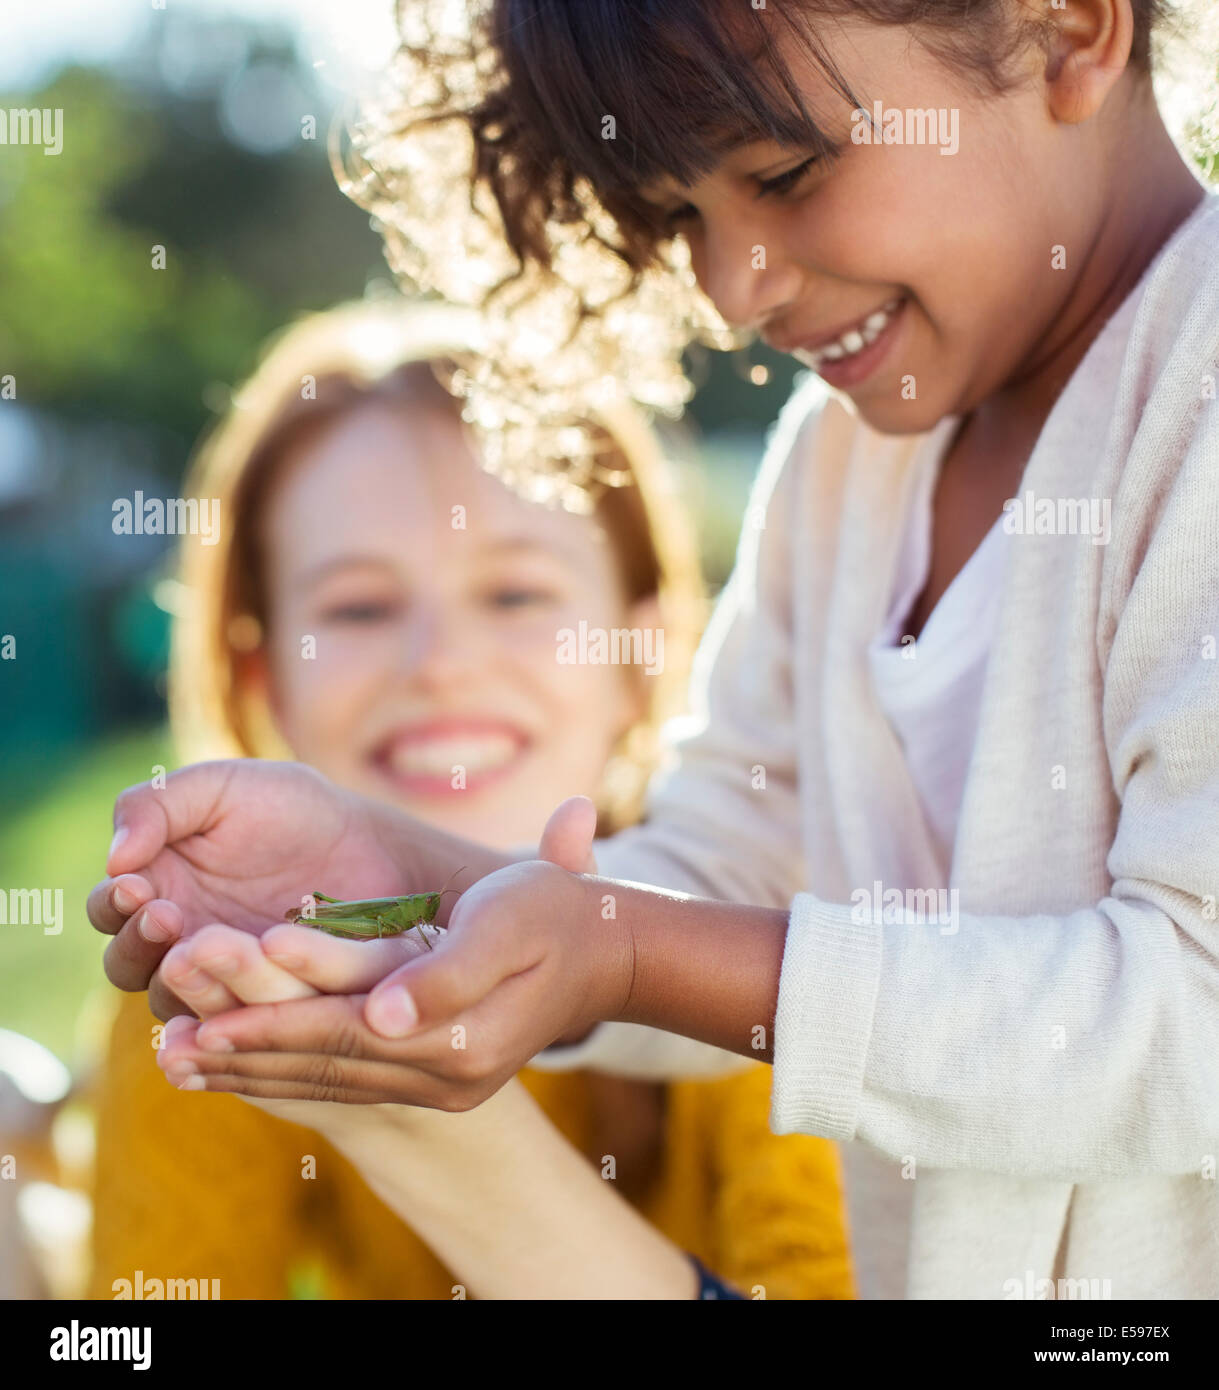 Madre e hija examinar insecto Imagen De Stock